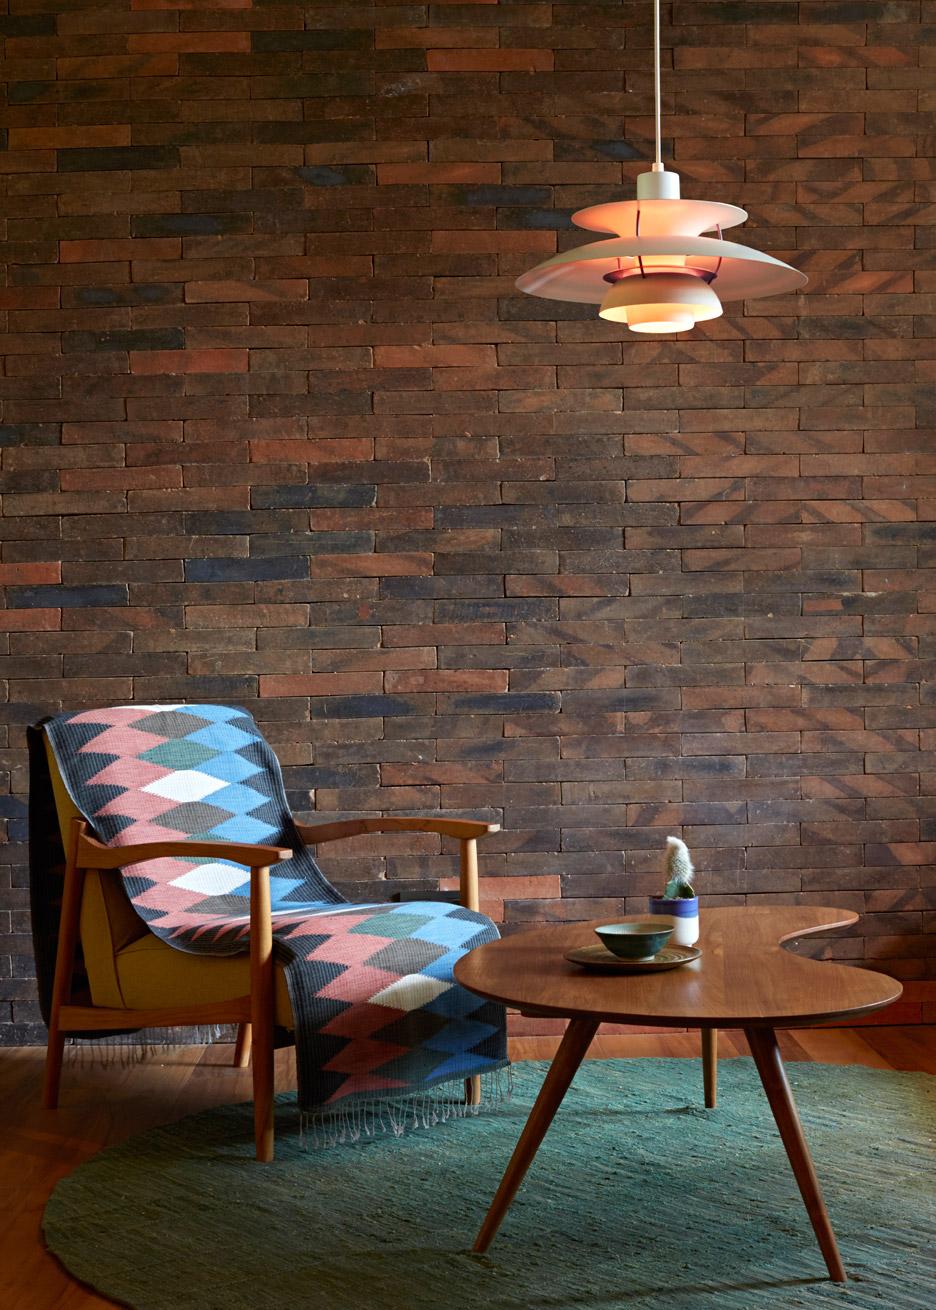 Katamama hotel showcases Bali\'s crafts, materials and textiles